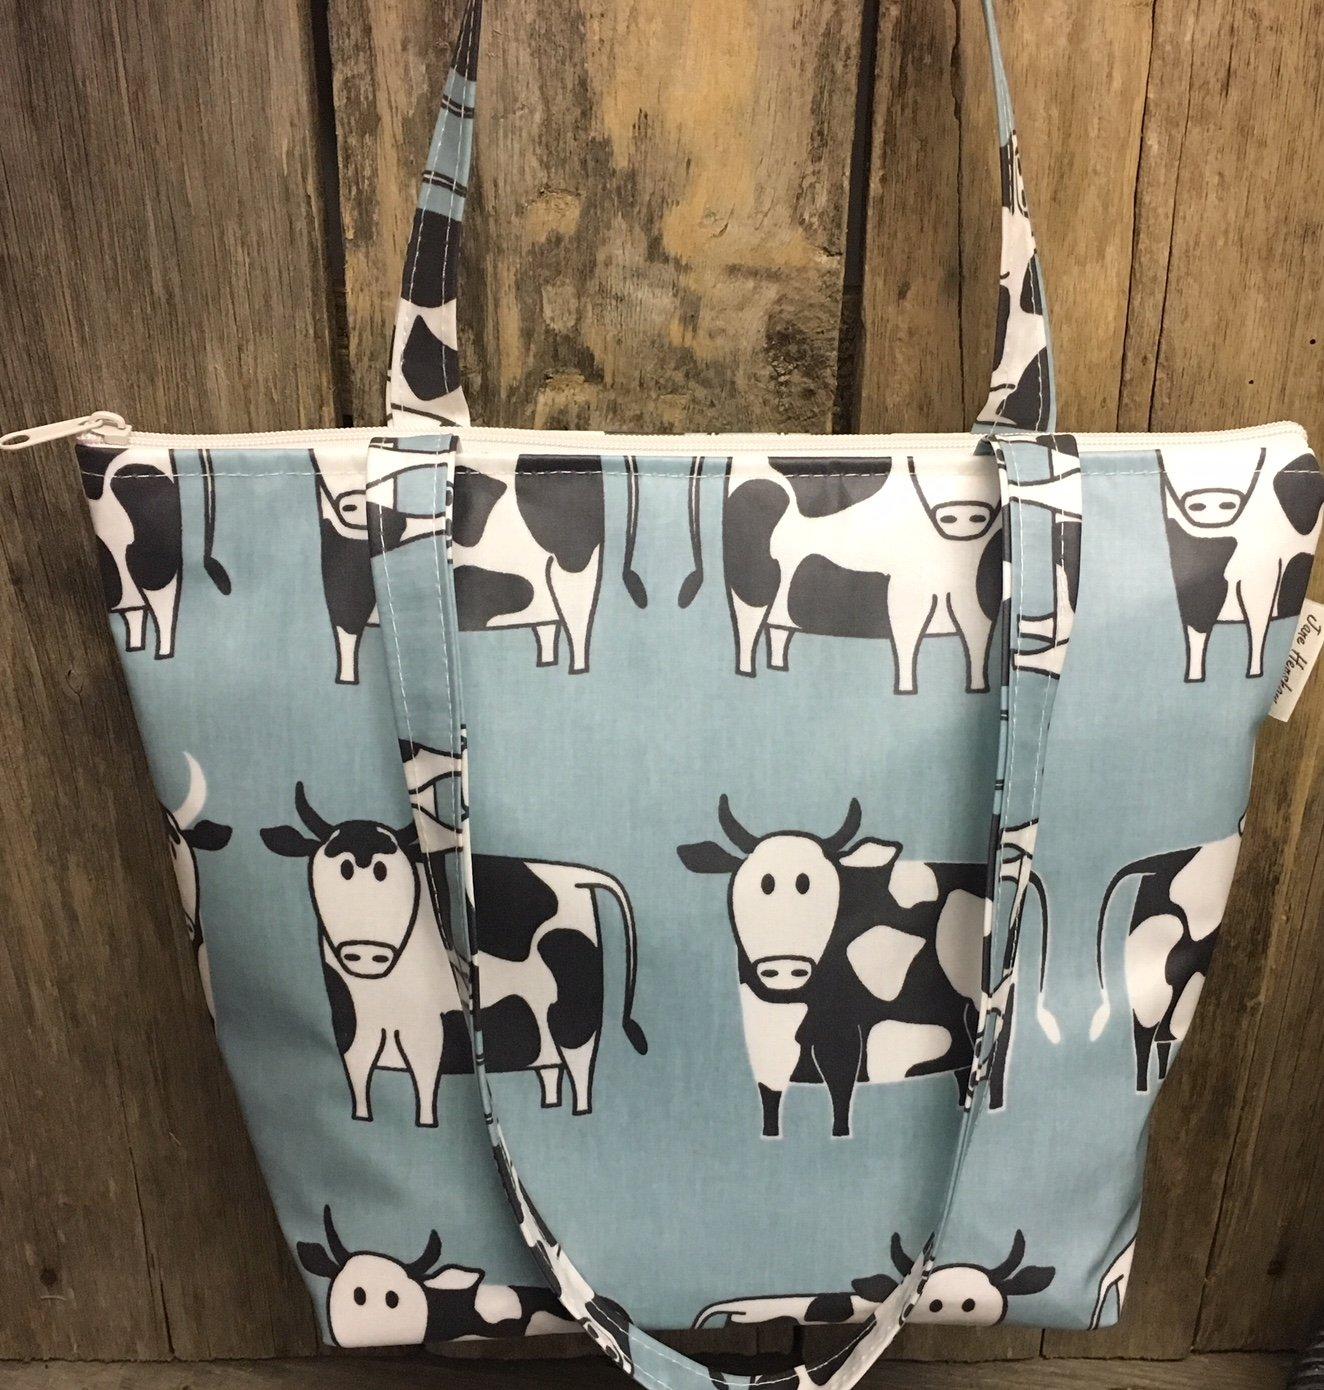 Tote bag,shopping bag,hand bag,book bag,school,bag,cows oilcloth - handmade-bags